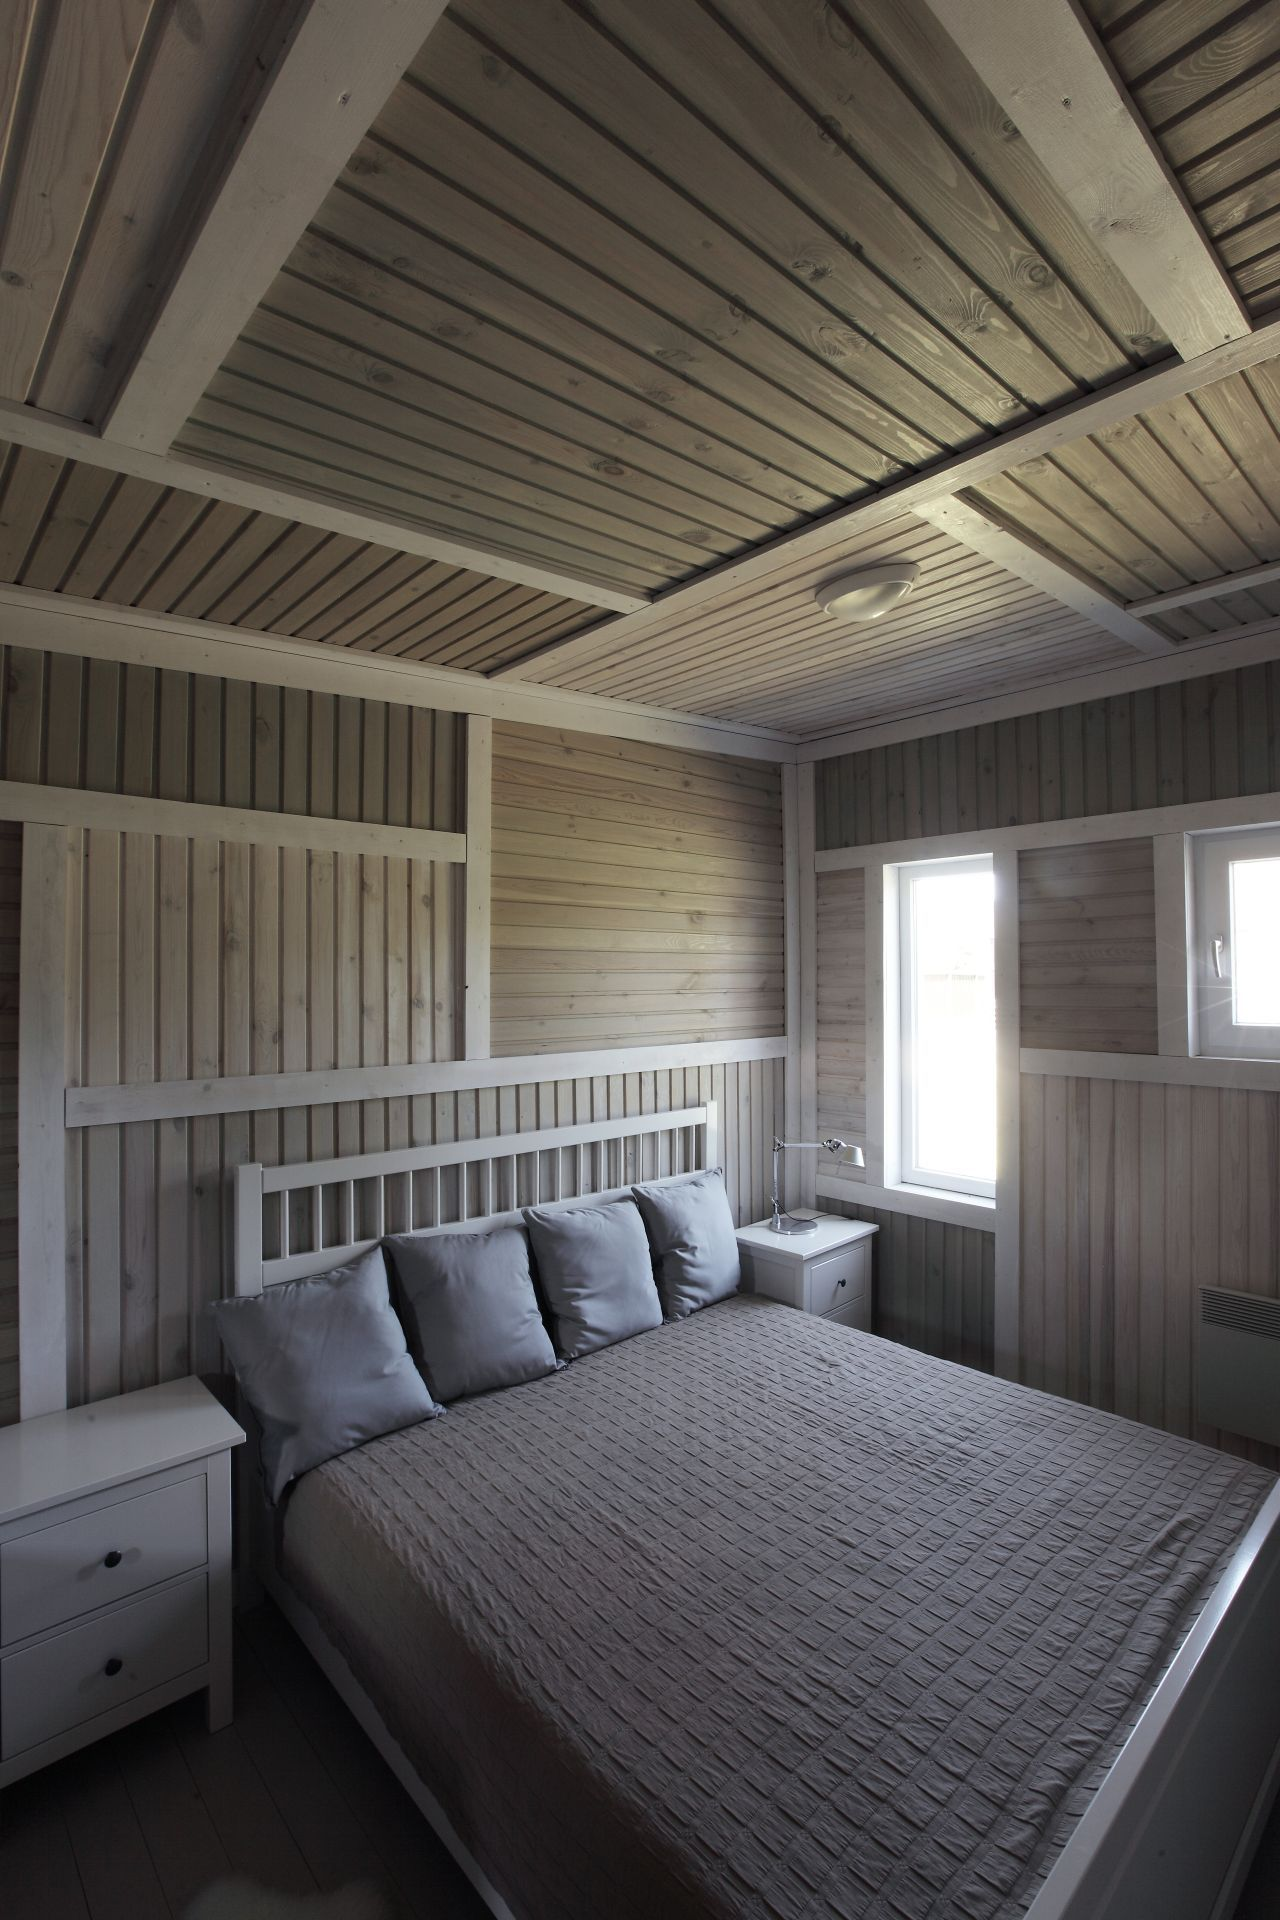 51ef0d45e8e44e6da300007b_deco-pattern-house-peter-kostelov_kostelov_deco_pattern_bedroom_01